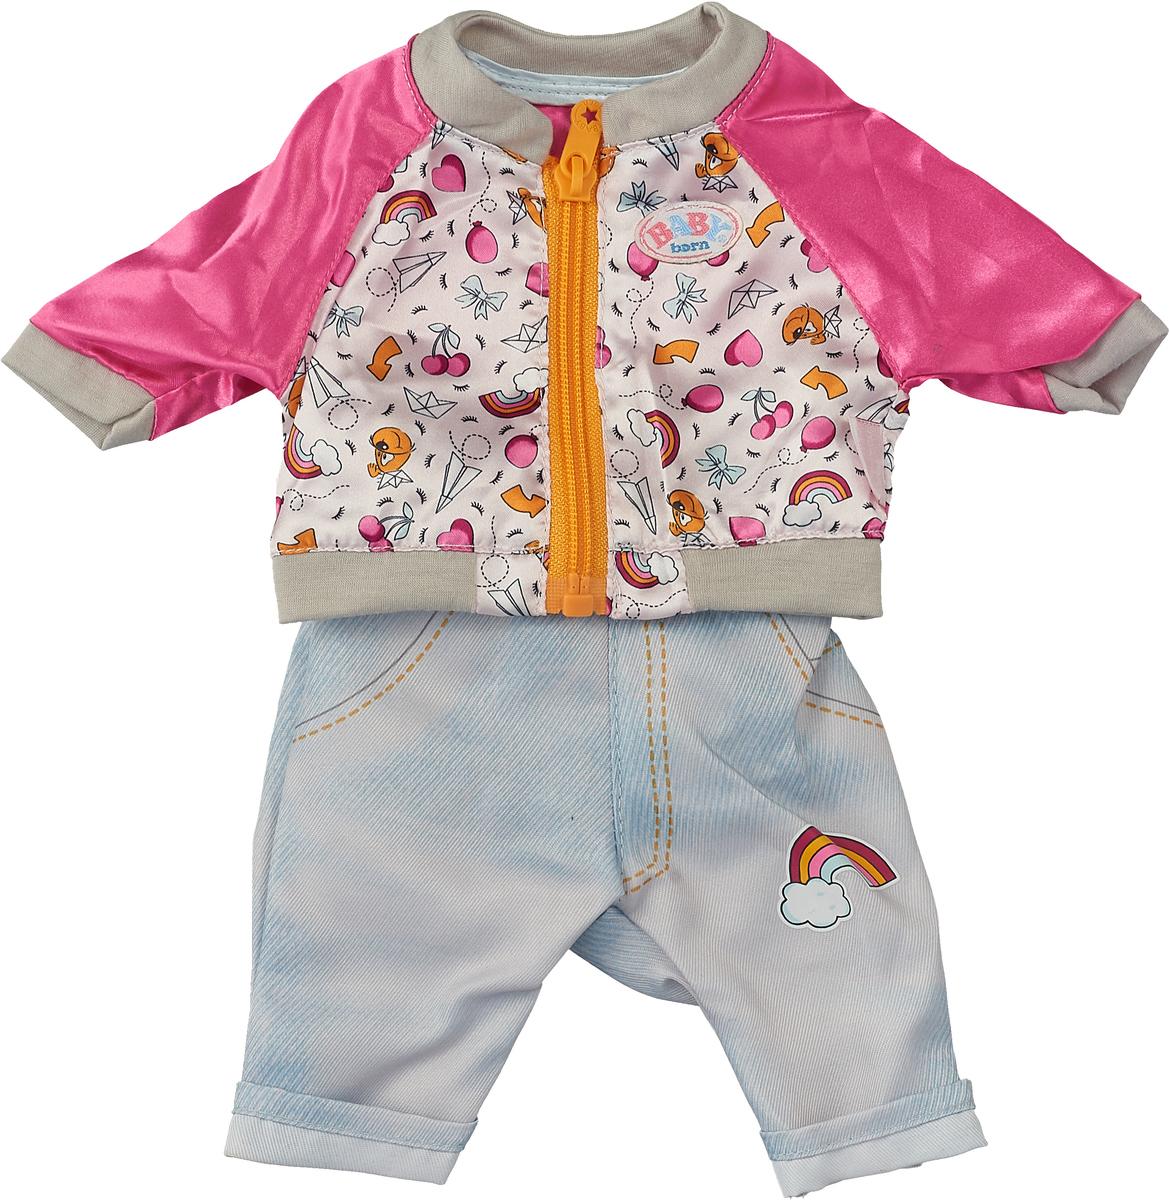 Одежда для куклы Zapf Creation BABY born, 824-542_куртка розовая, штаны голубые